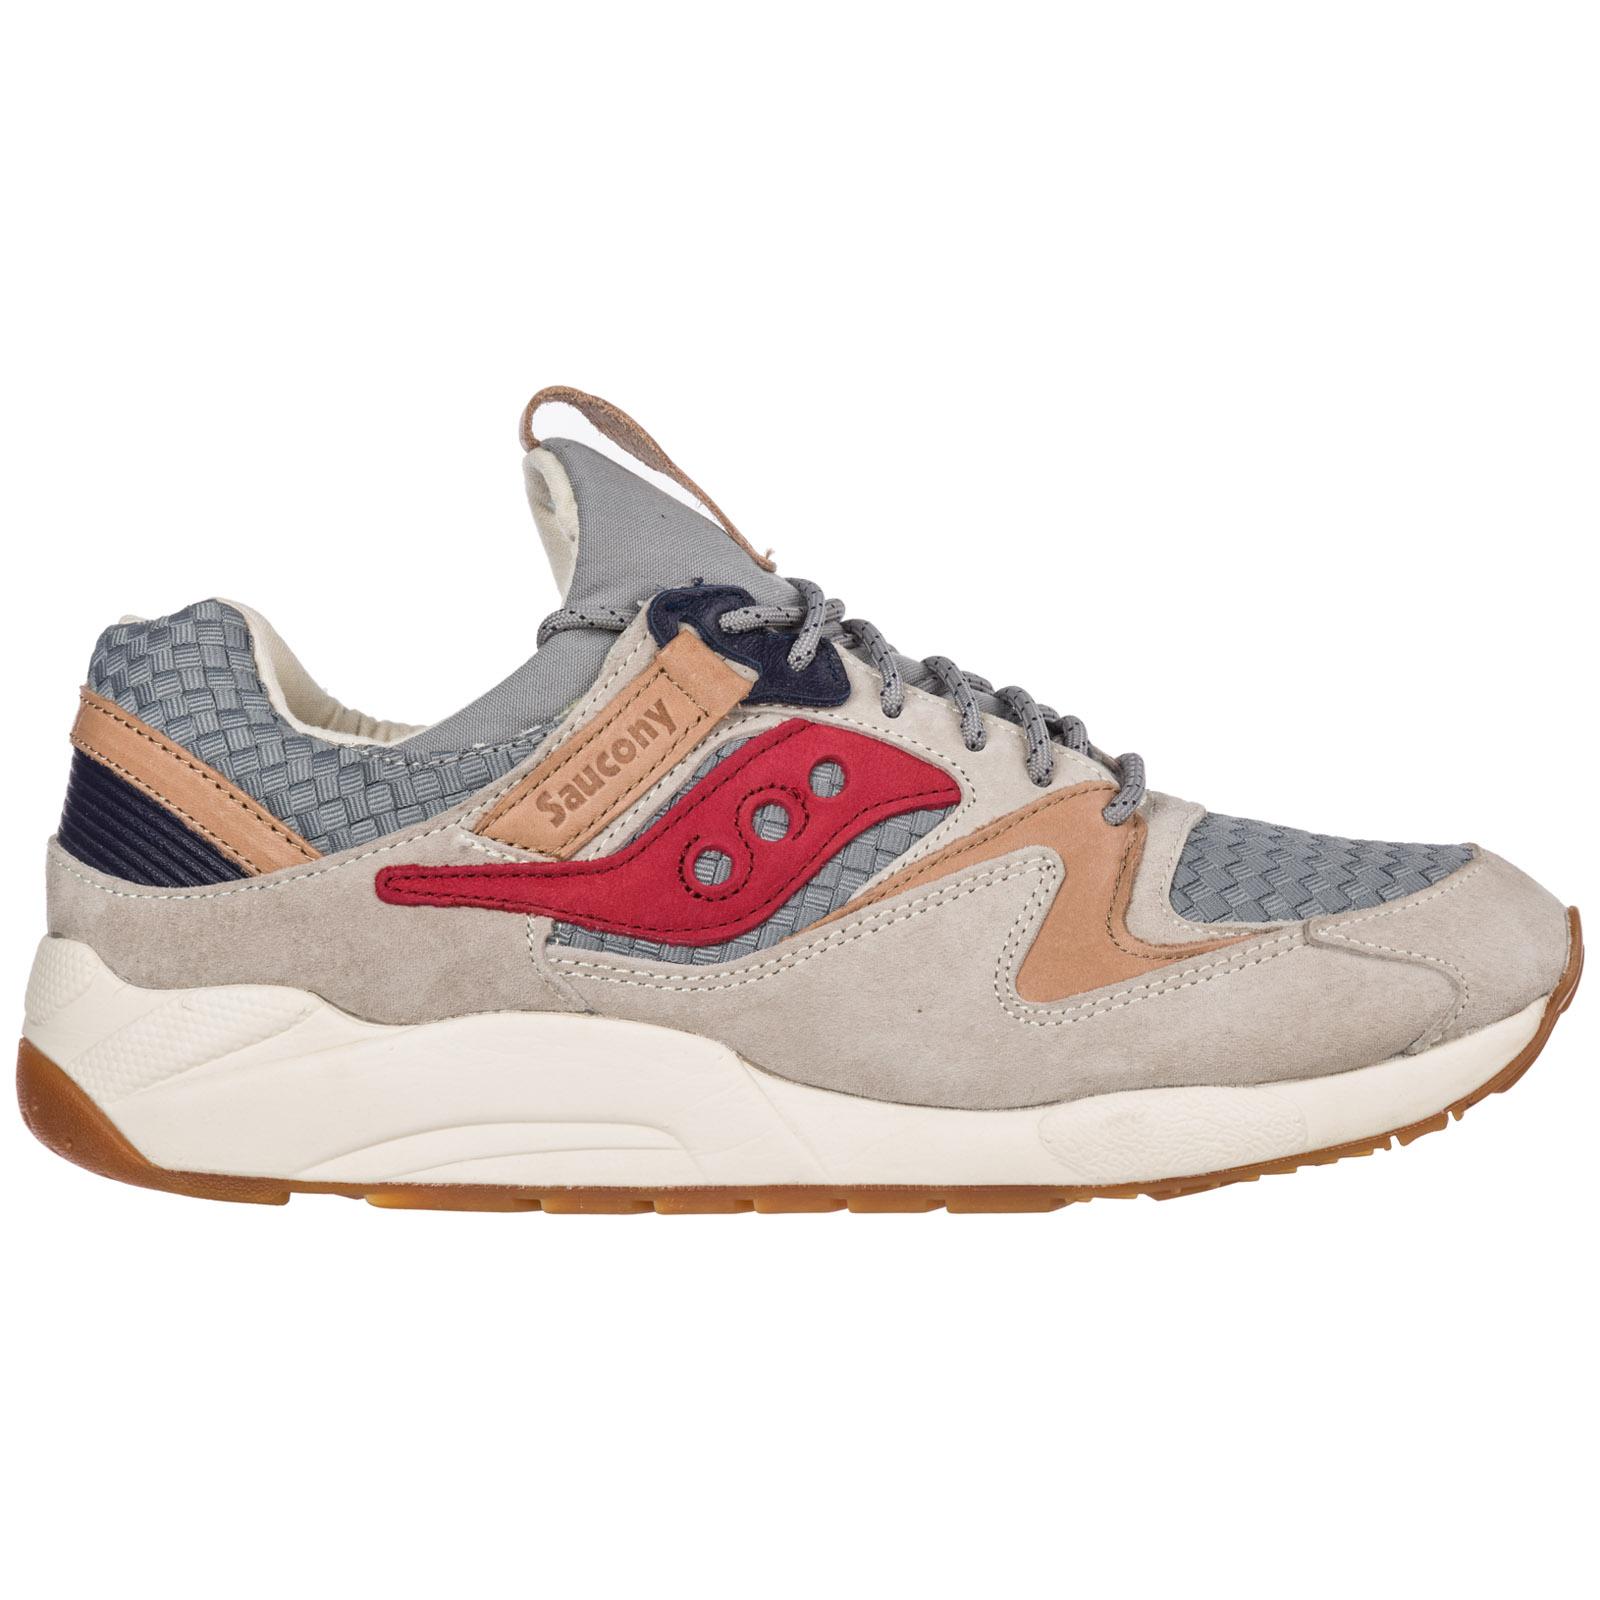 8270e07103a3 Chaussures baskets sneakers homme en daim grid 9000 ...